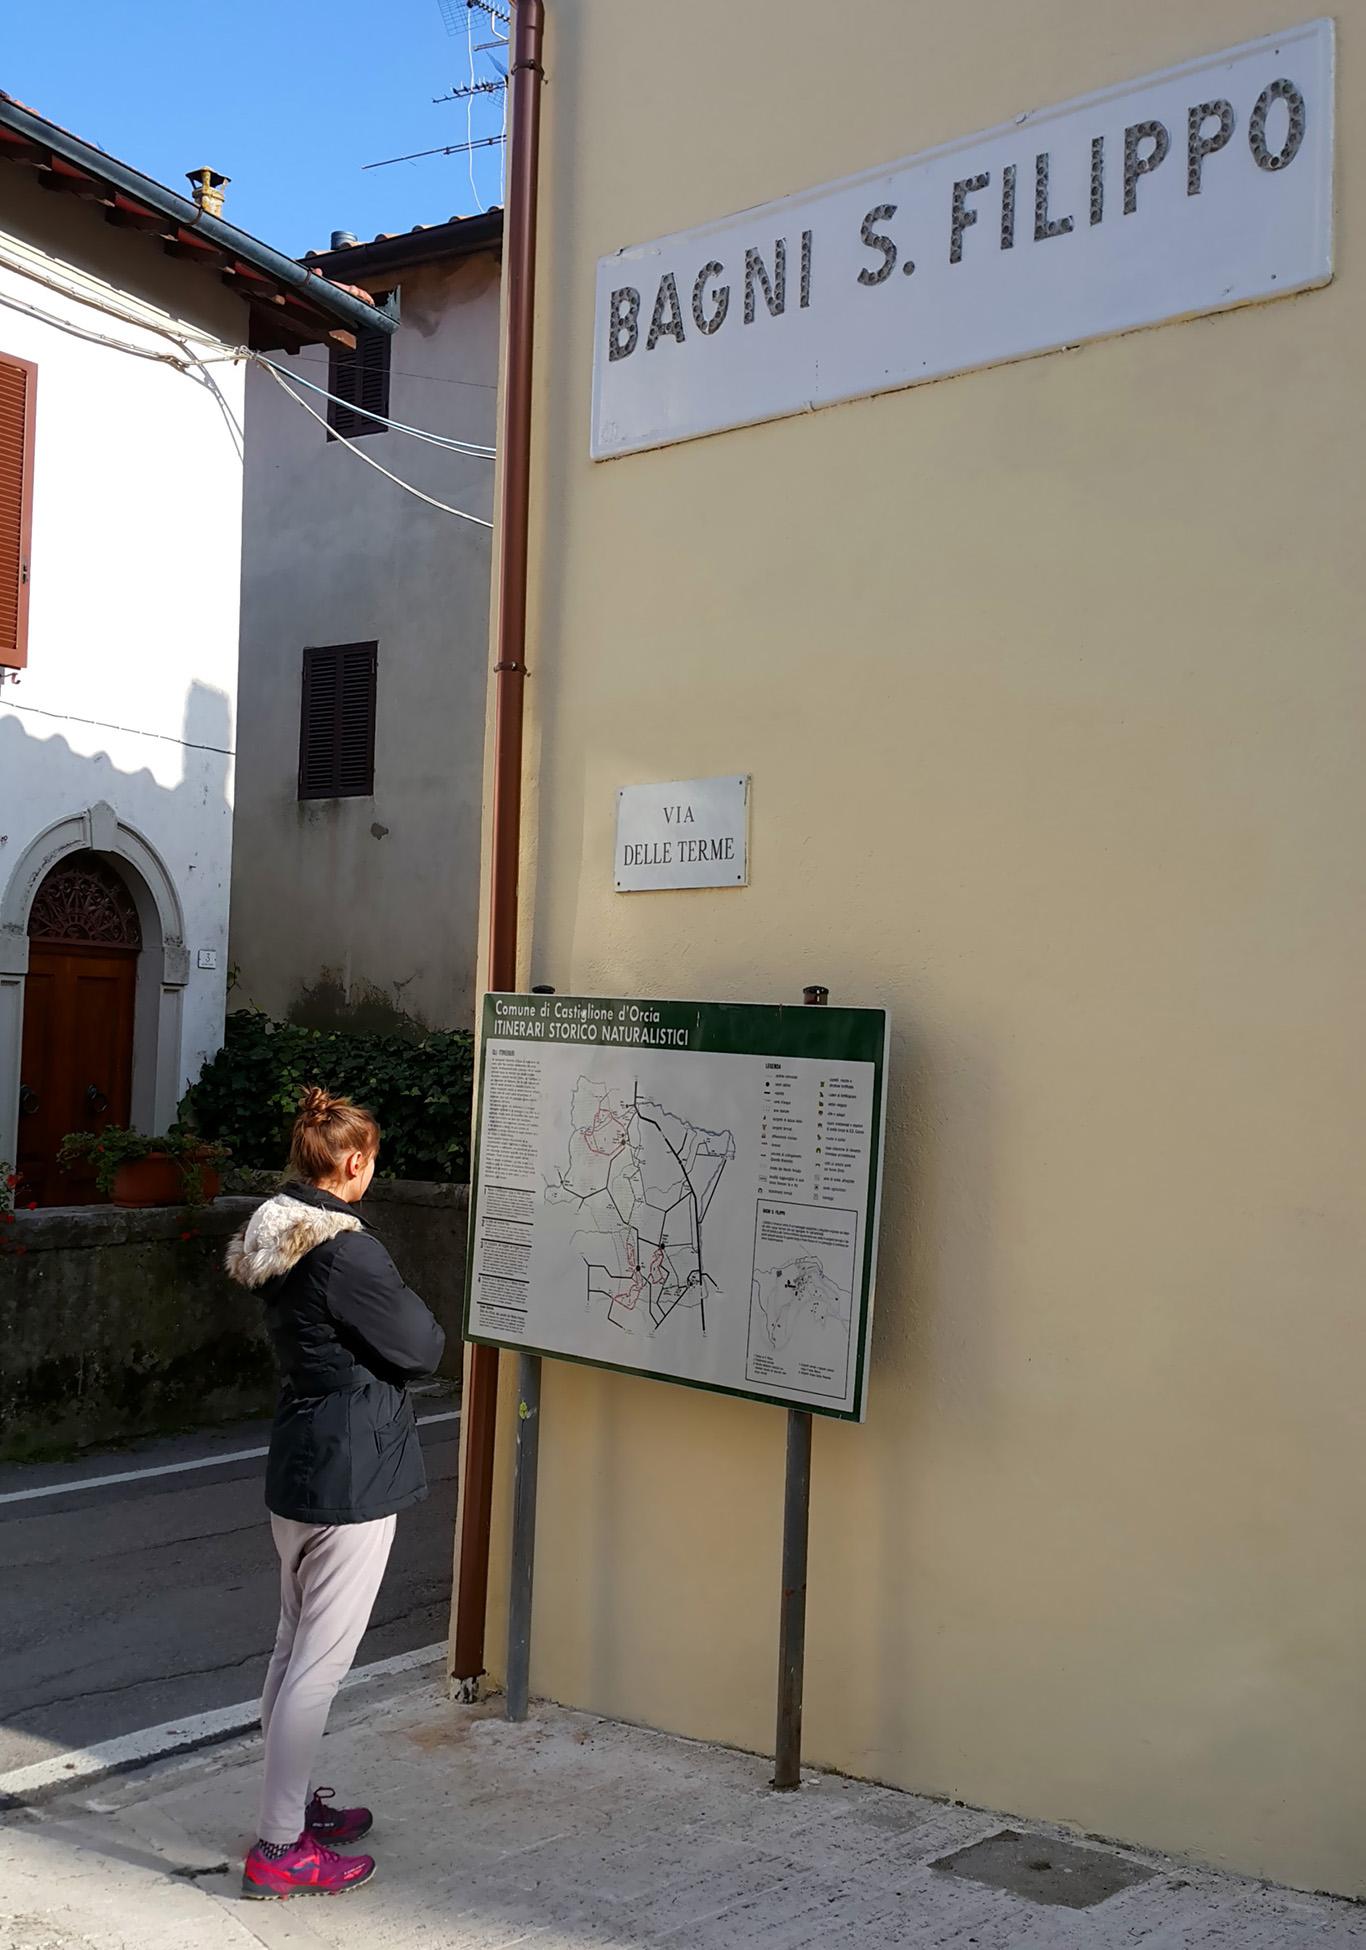 Bagni San Filippo